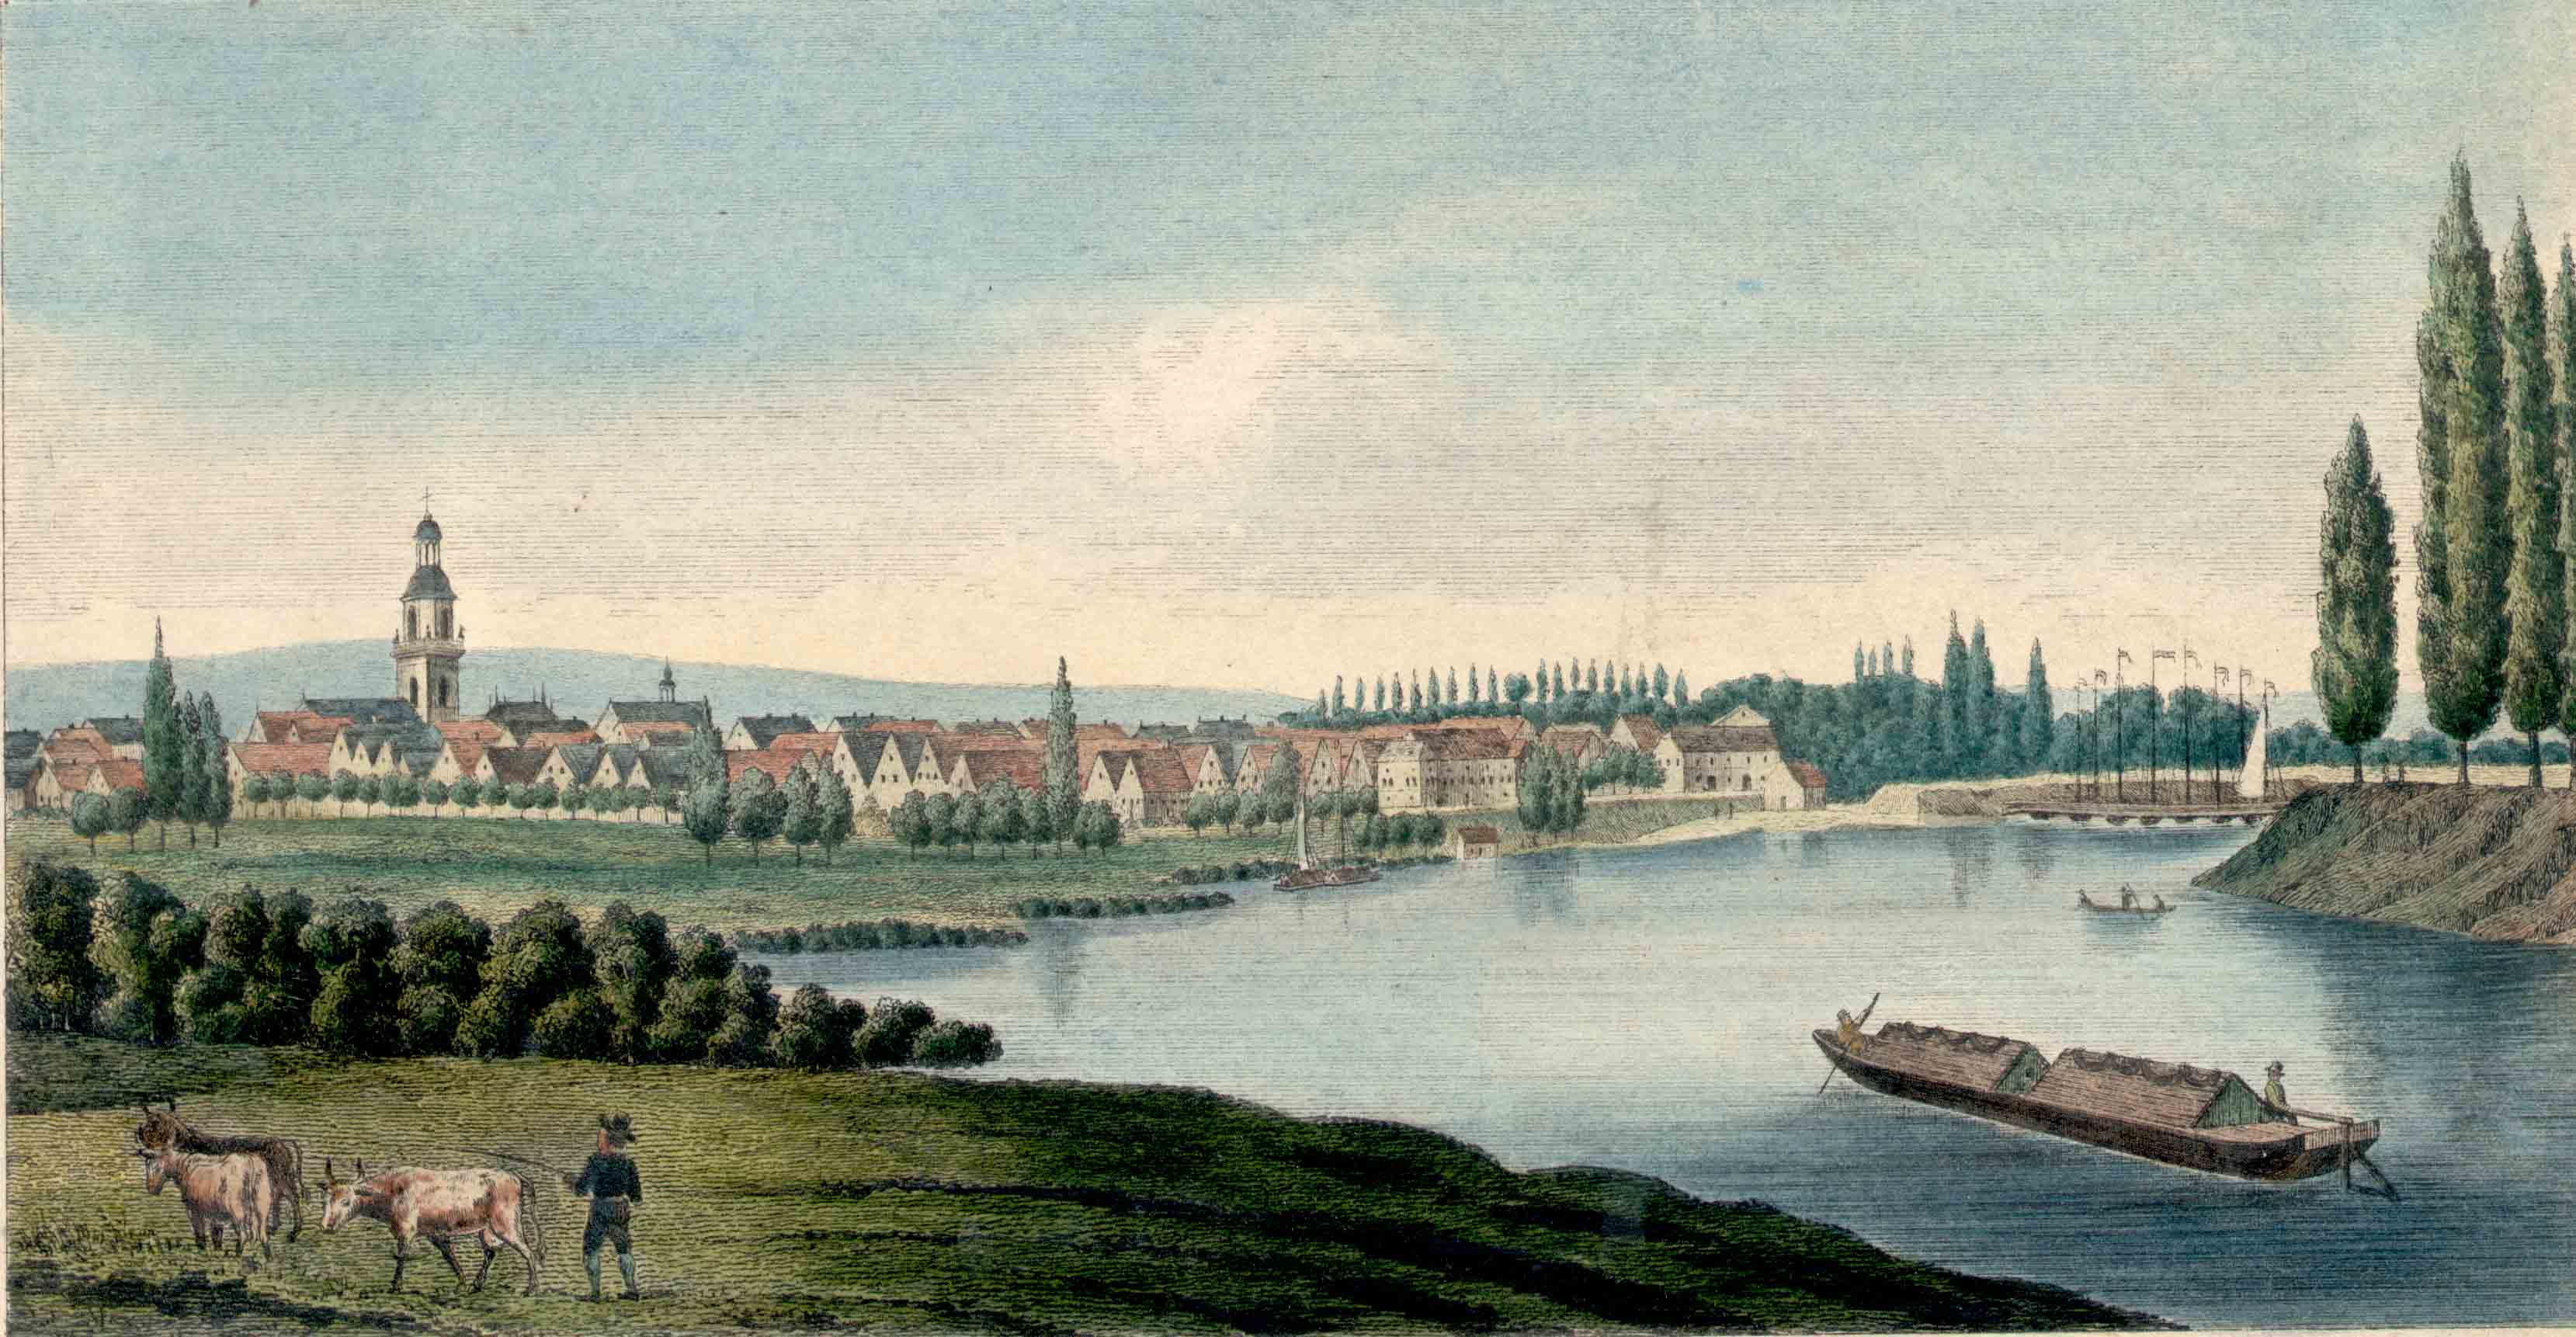 Rinteln um 1845